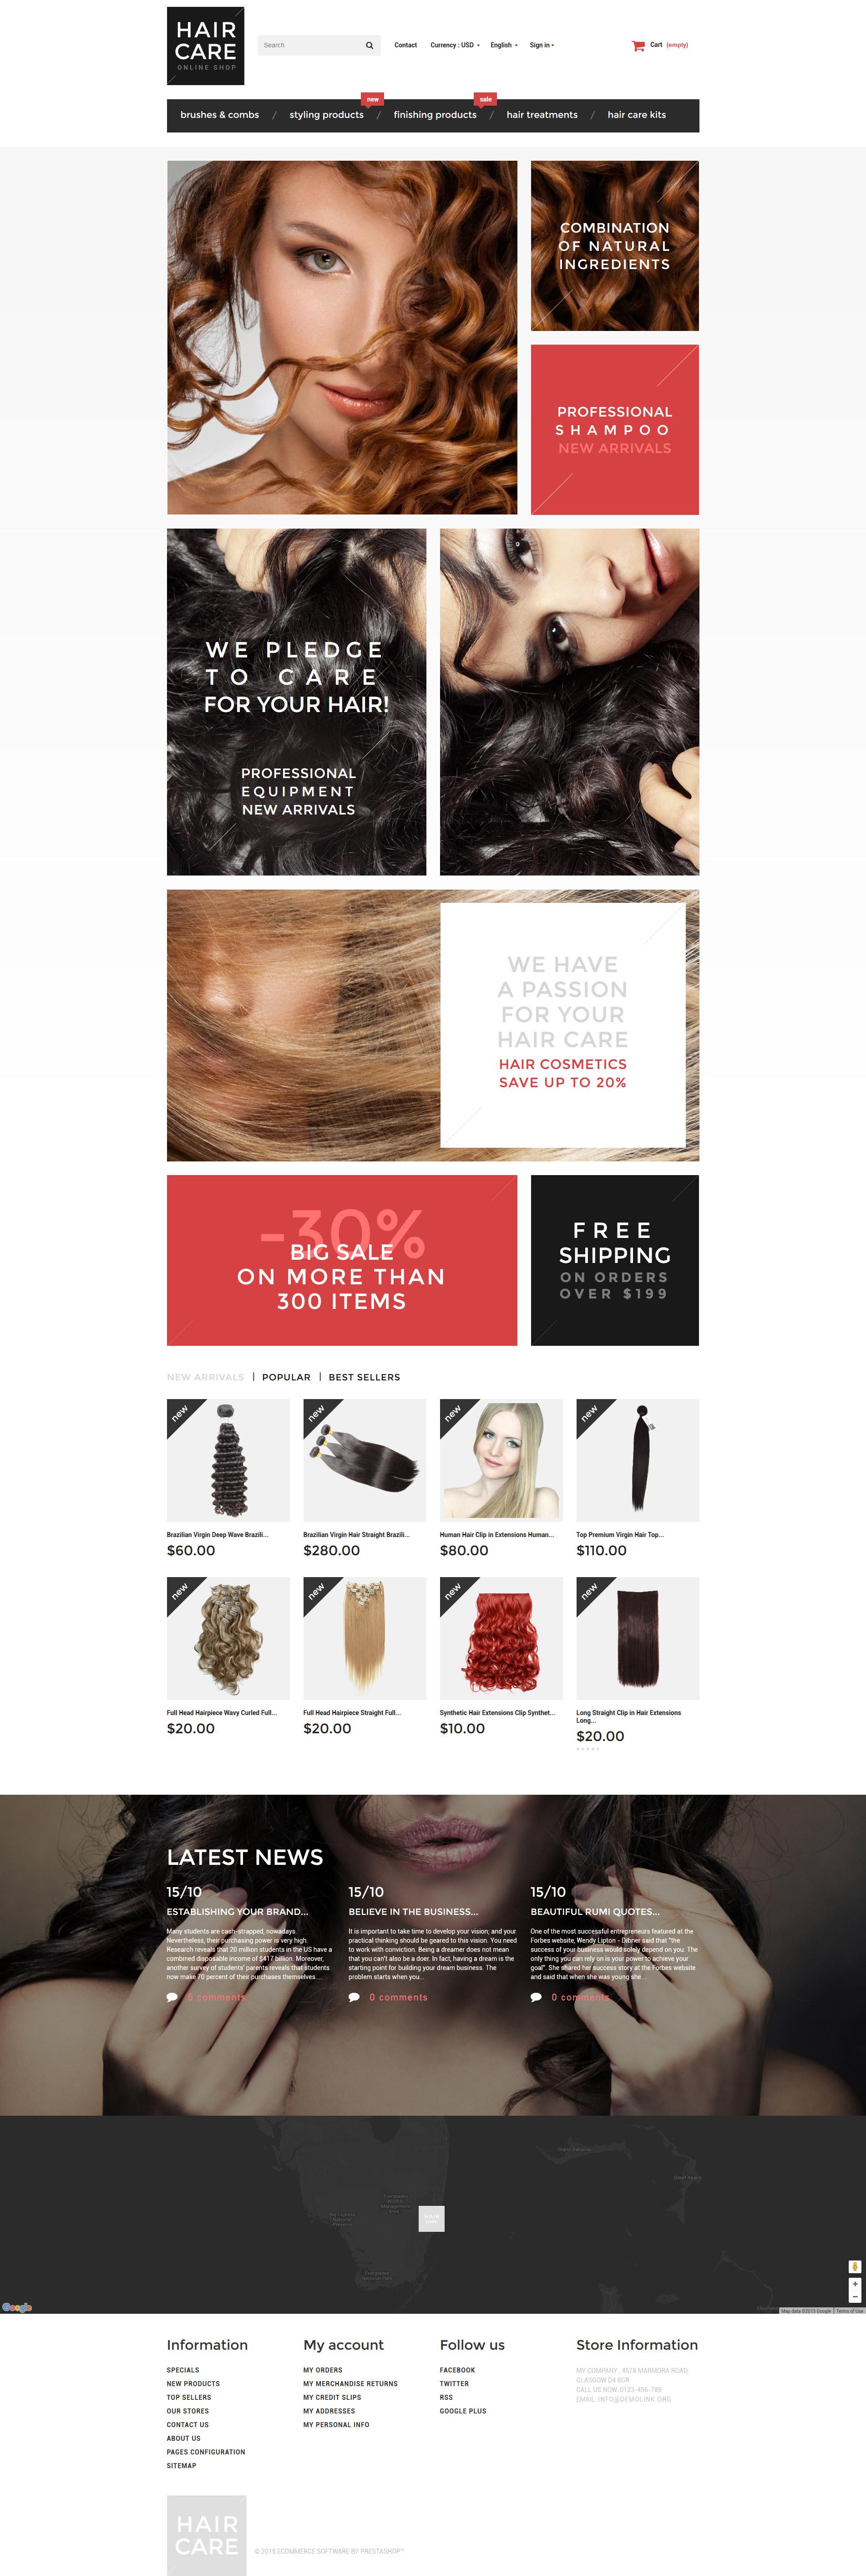 Responsywny szablon PrestaShop Hair Gloss #55757 - zrzut ekranu